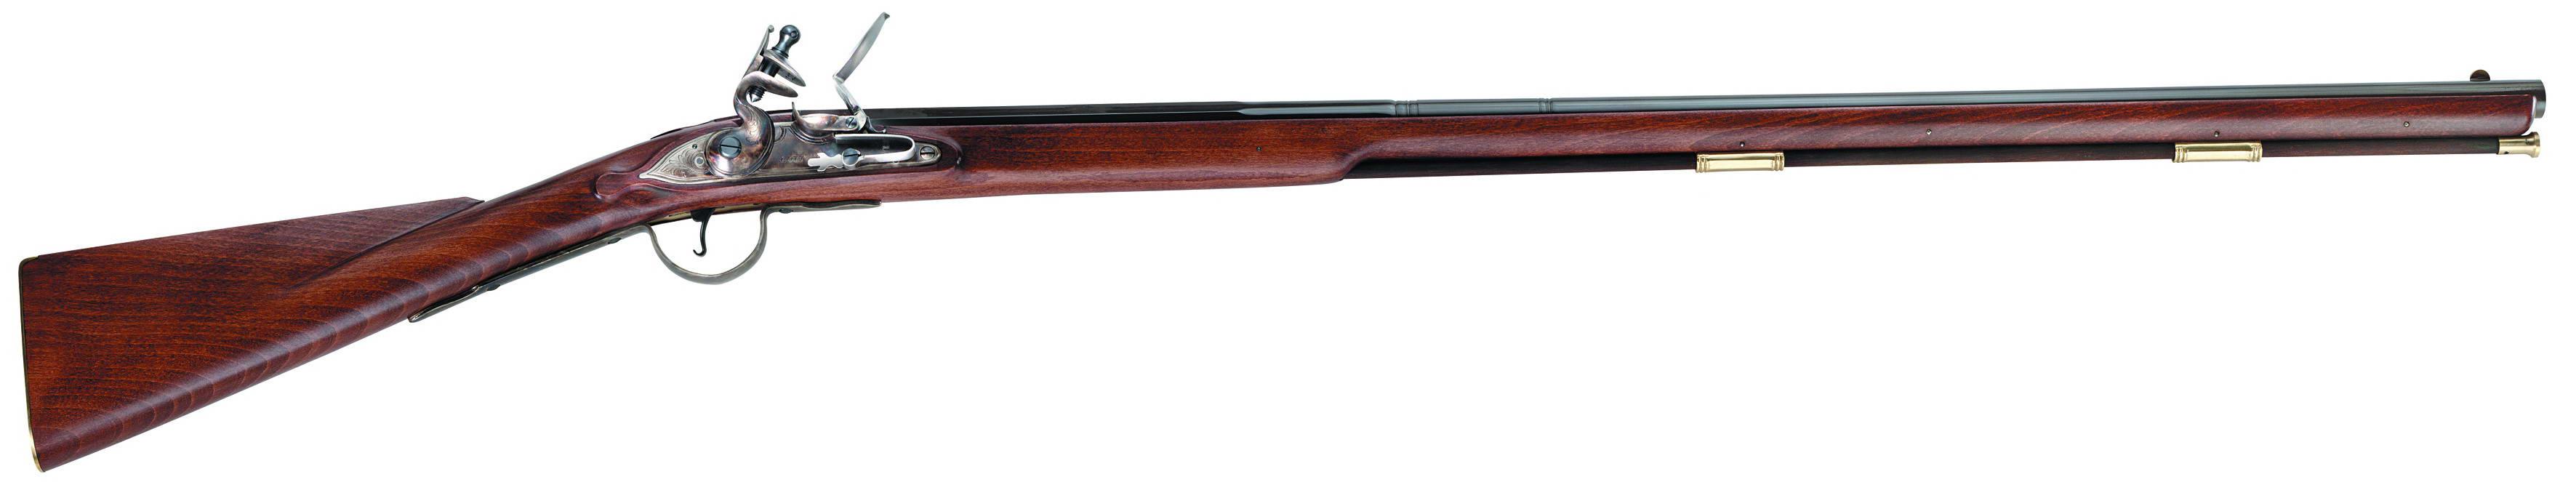 Kings Furniture Pa Cherry's Pedersoli rifle page (2)